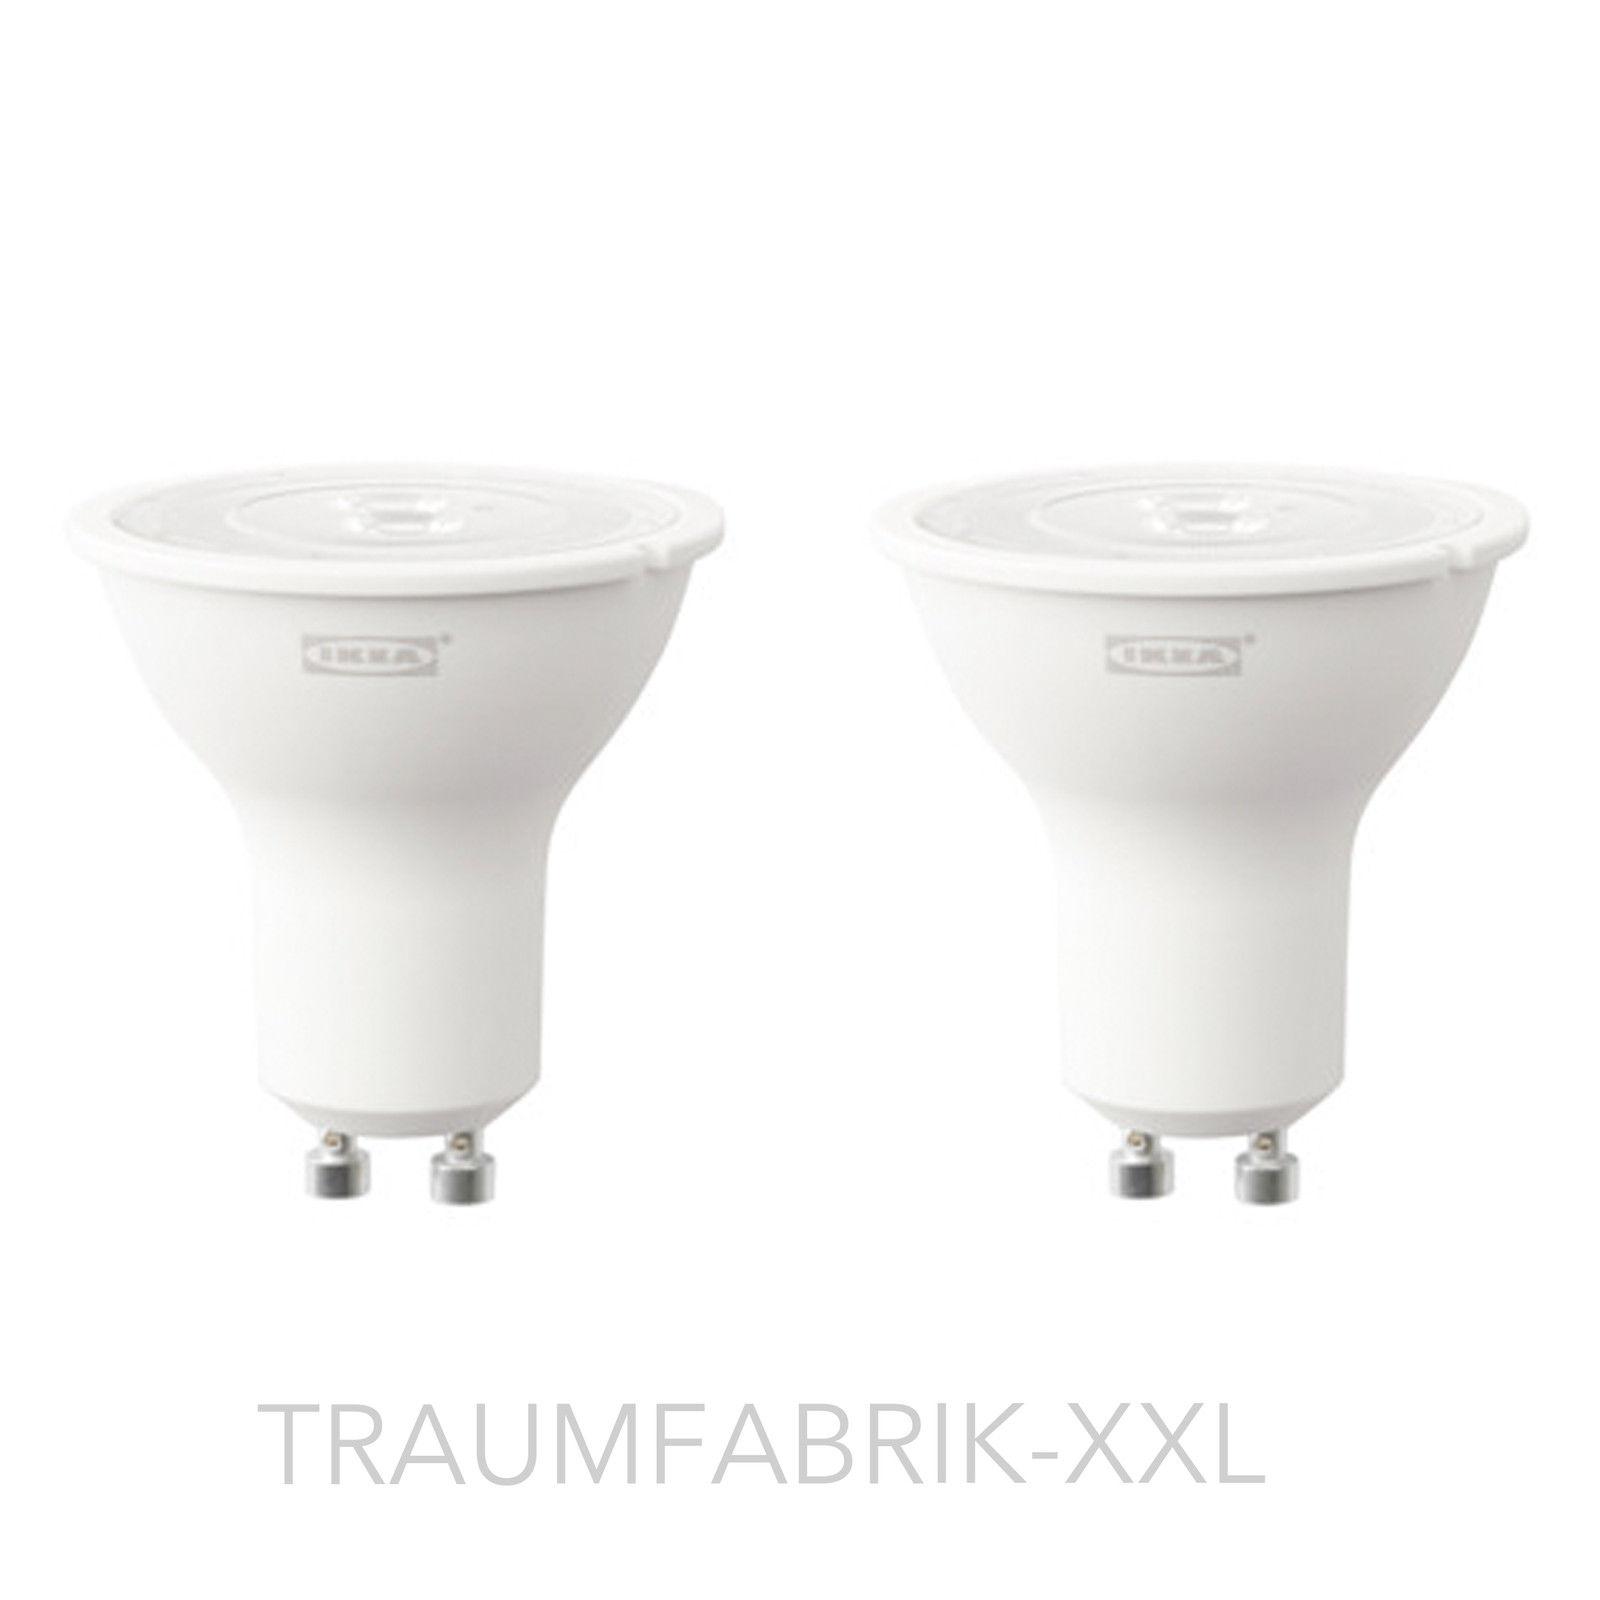 ikea ryet 2 st ck led lampe lampen gu10 3w 200 lm leuchtmittel spots neu ovp traumfabrik xxl. Black Bedroom Furniture Sets. Home Design Ideas